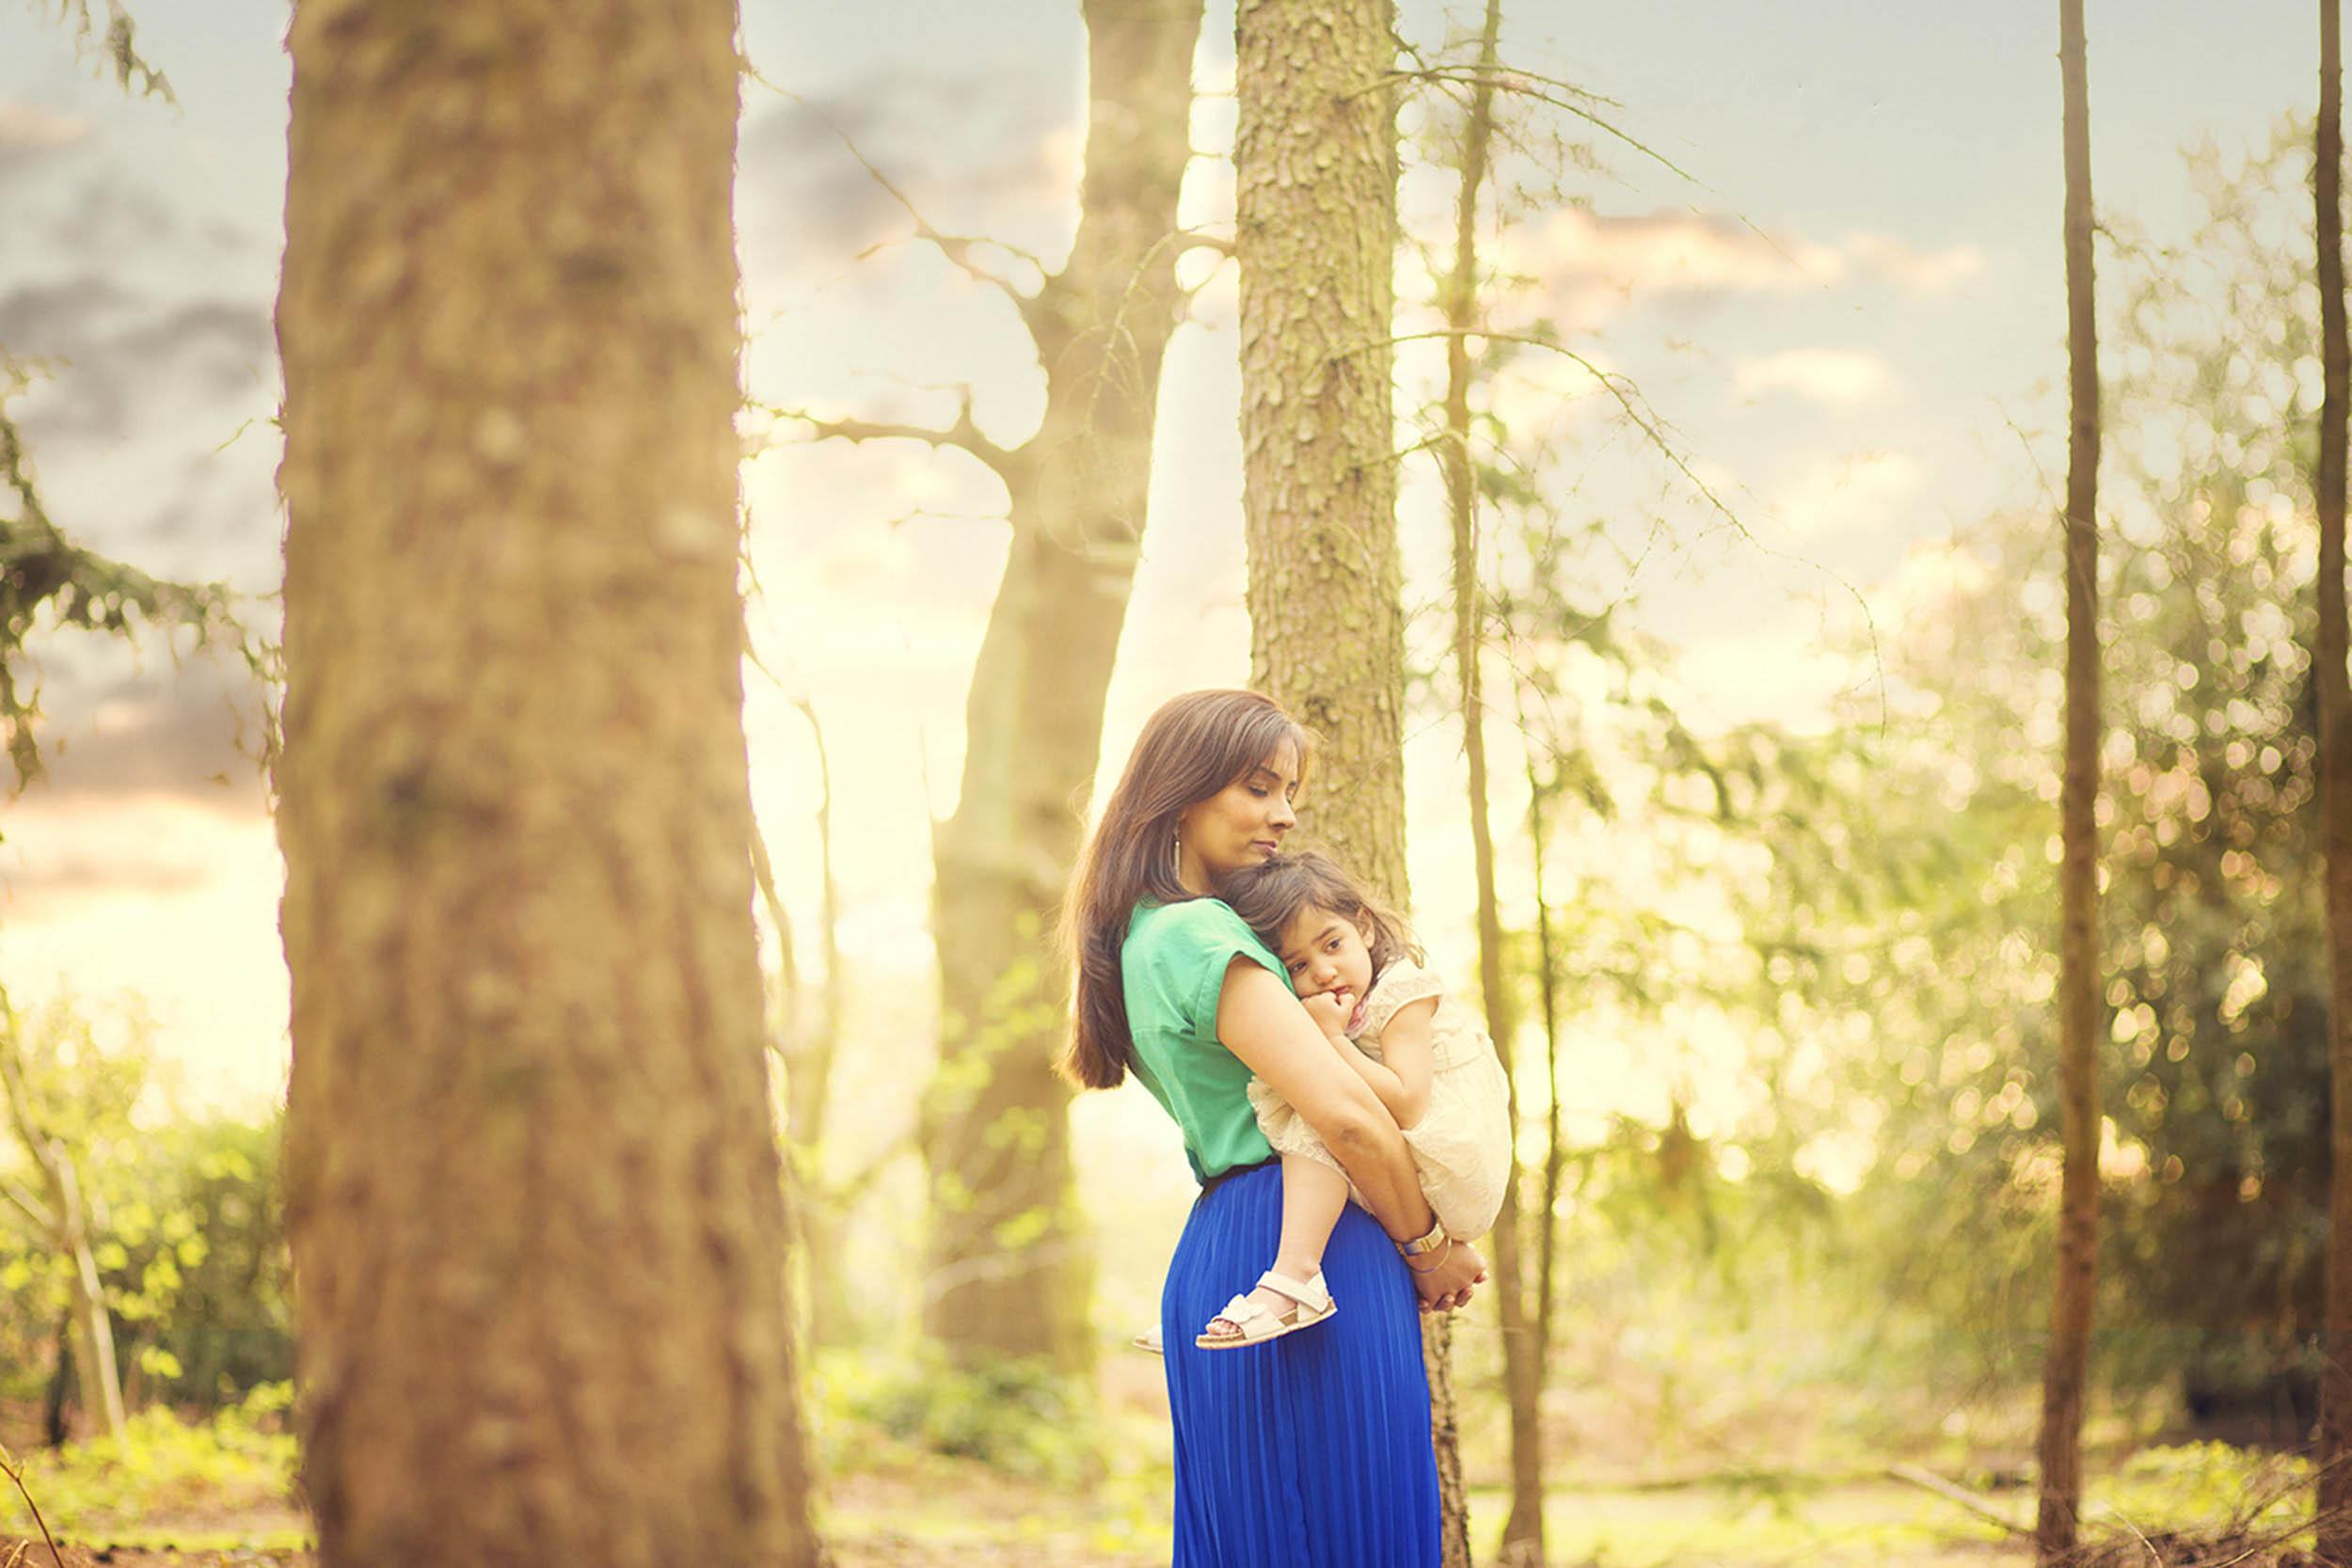 Slough Outdoor Family Photographer 1.jpg